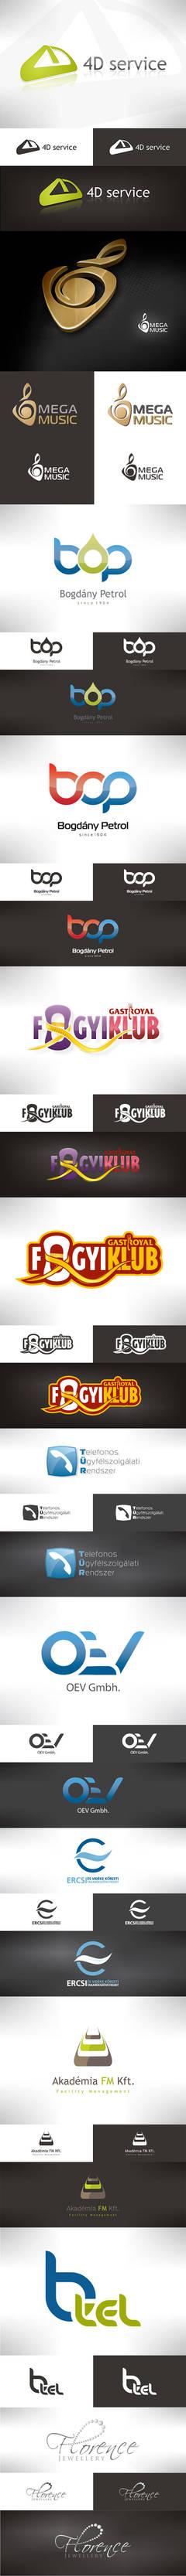 Best of my logo designs by VictoryDesign